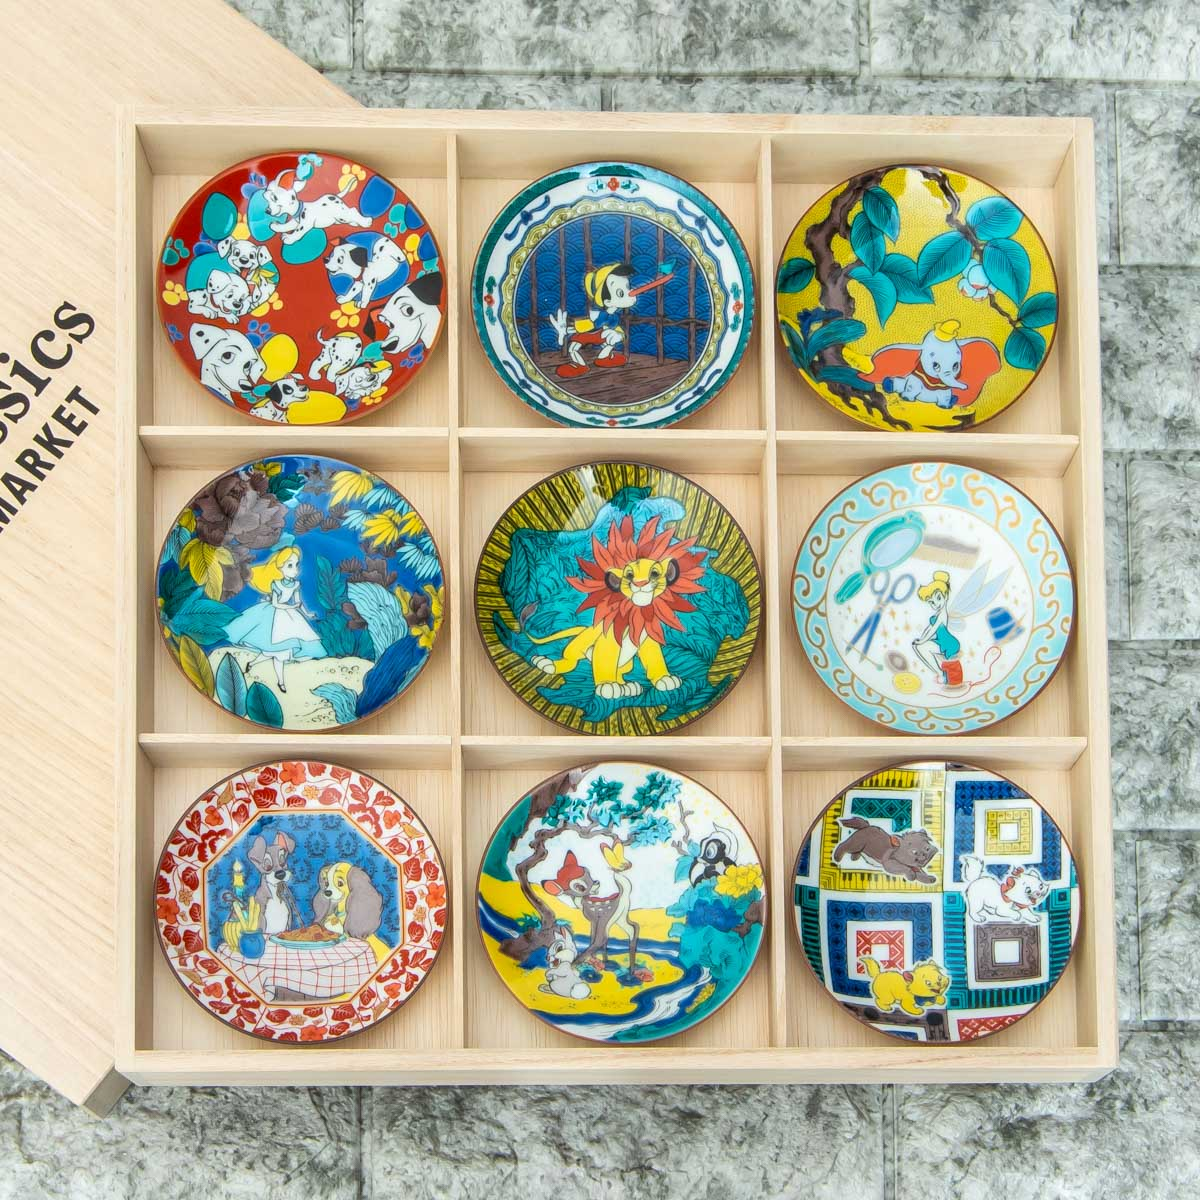 Disney Classics MARKET(ディズニー クラシックス マーケット)「九谷焼豆皿セット」集合